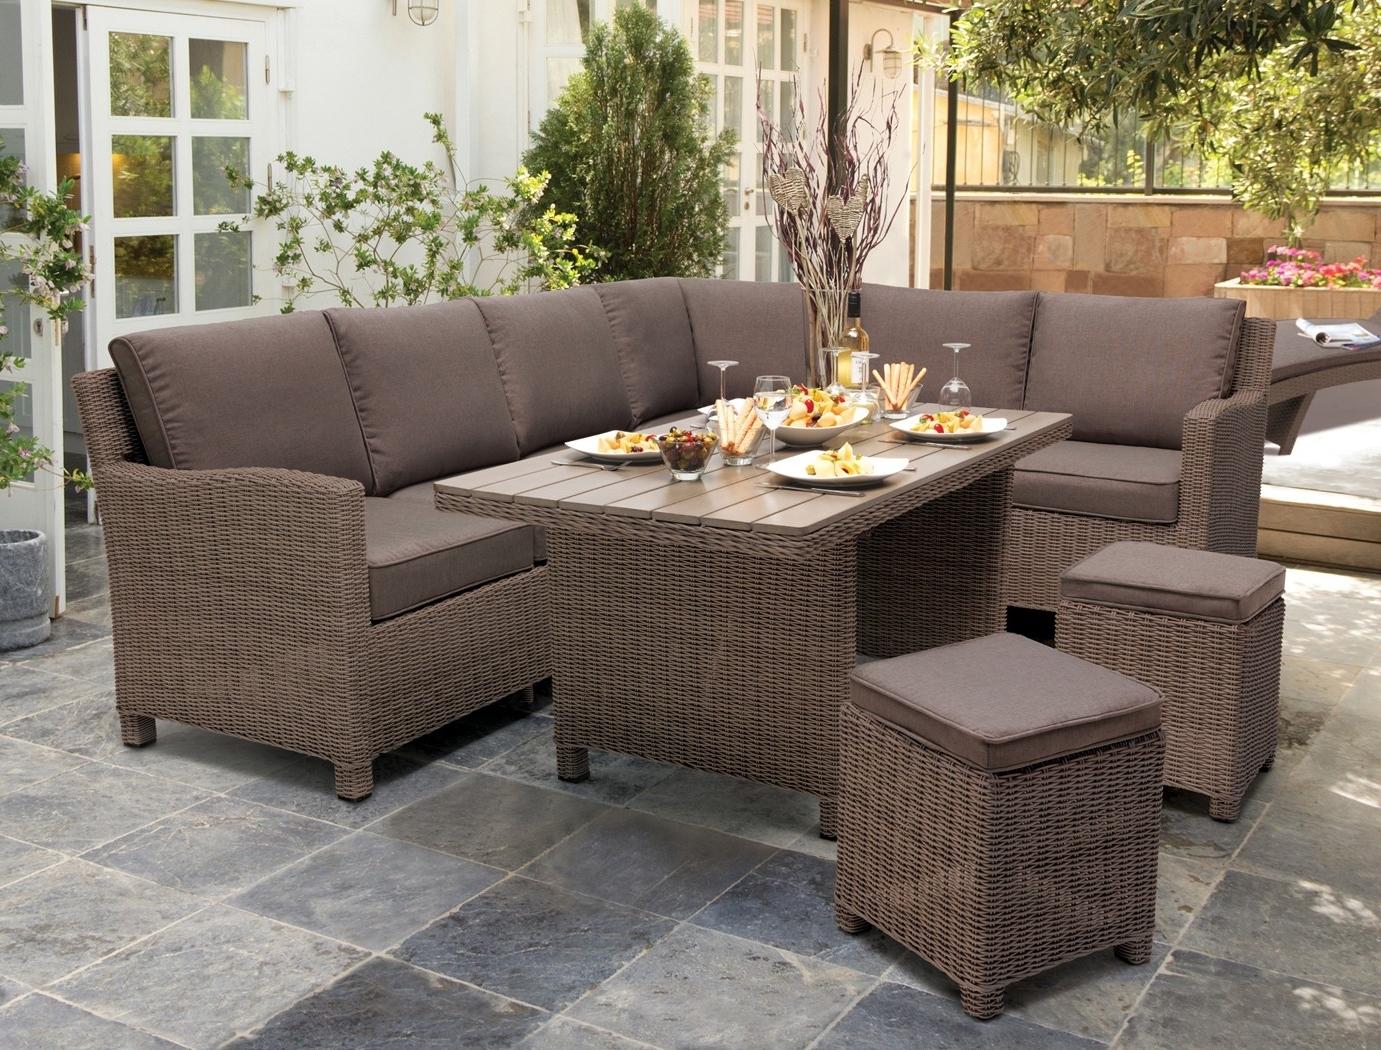 Kettler Palma Corner Set – Kettler Furniture – Patio Furniture For Most Popular Krevco Patio Umbrellas (View 4 of 20)